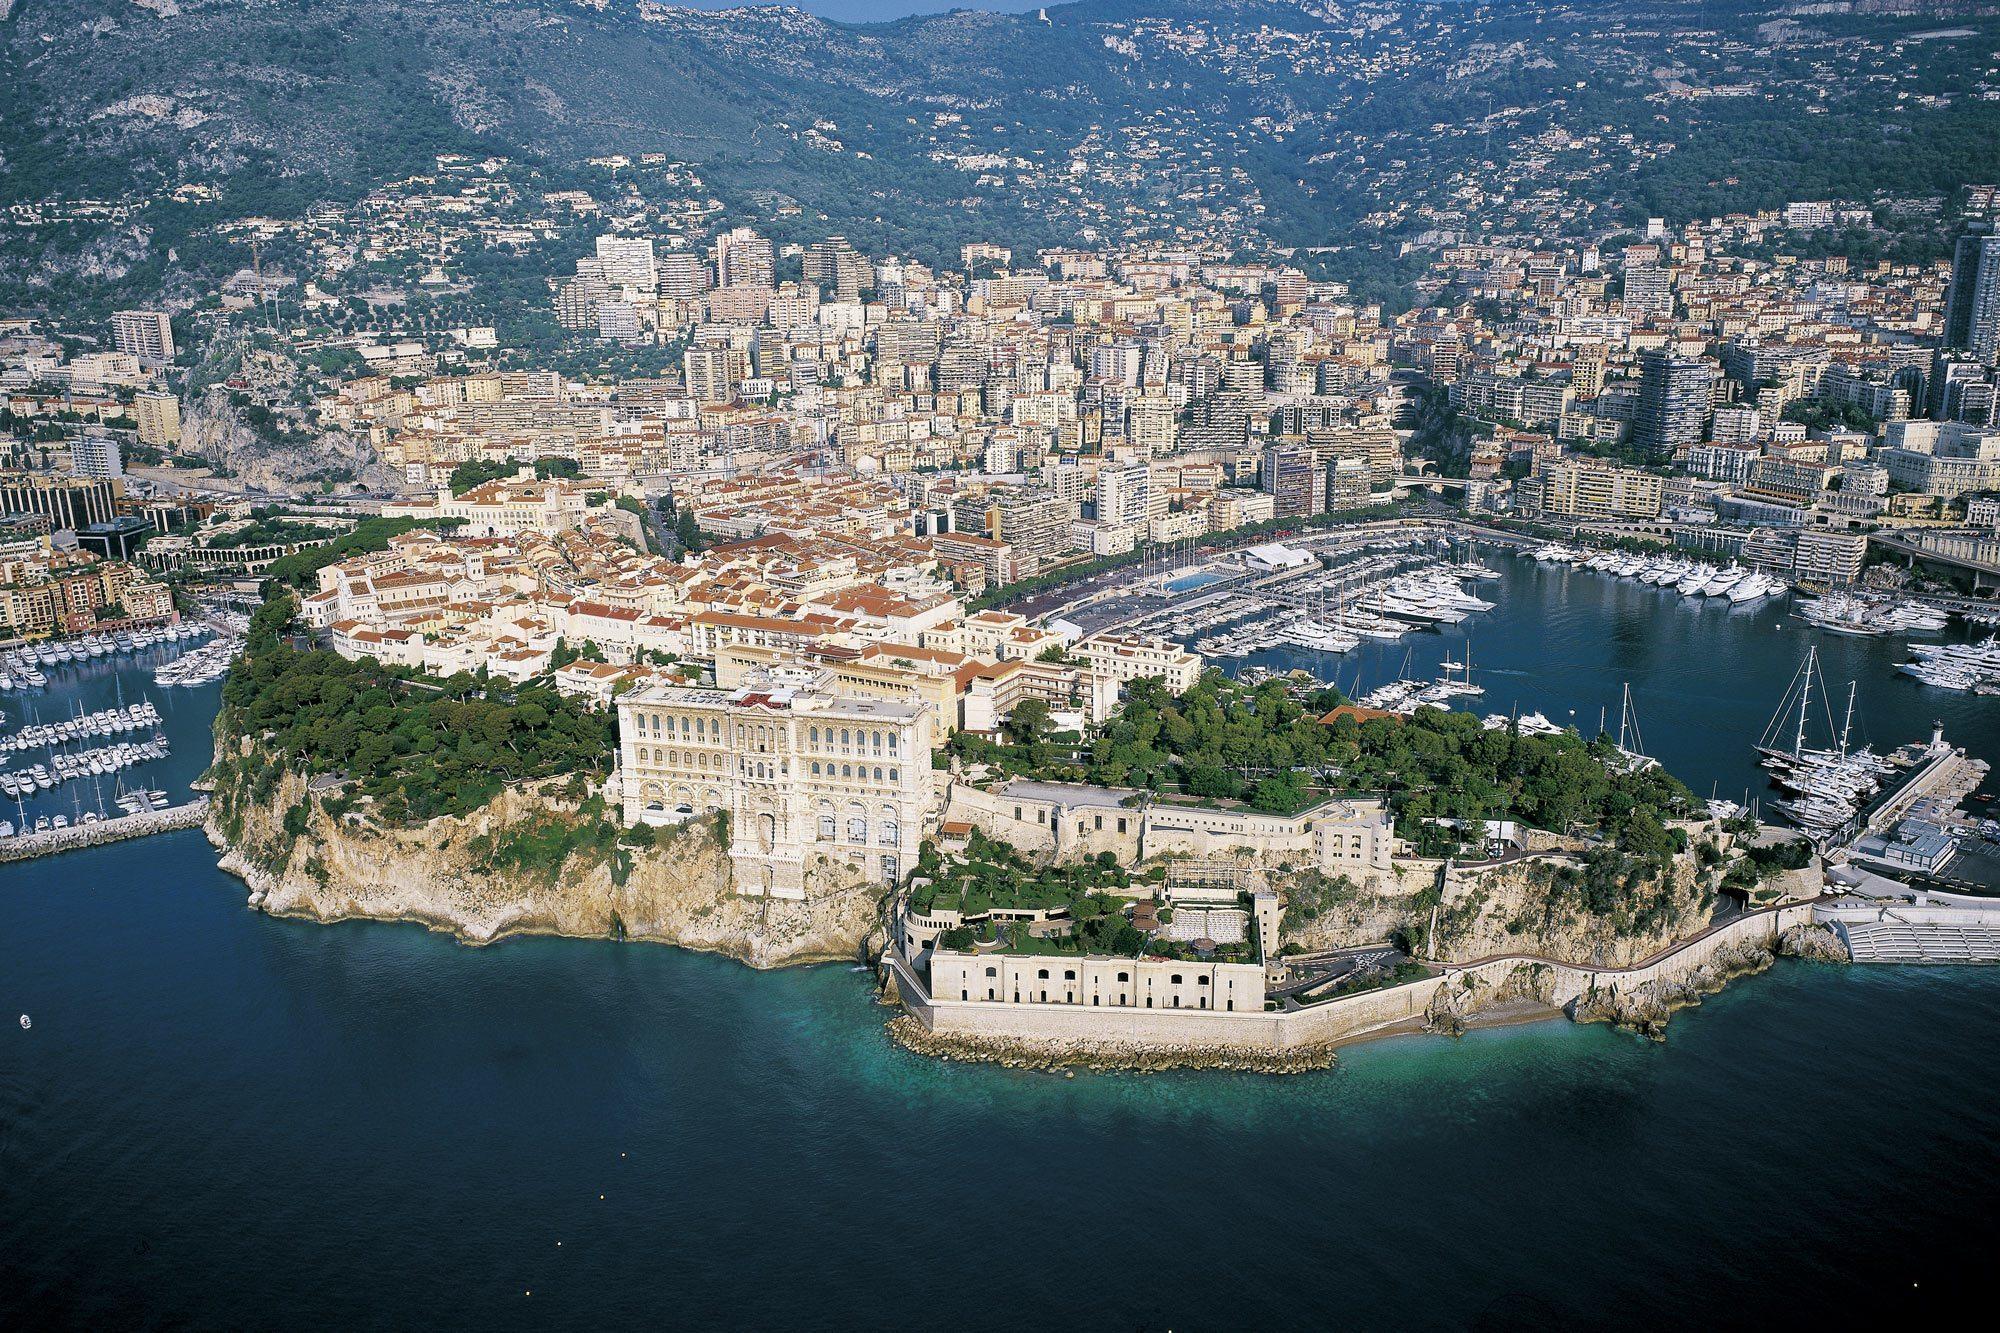 Monaco les incontournables camping cap taillat ramatuelle - Camping les jardins de la mer antibes ...